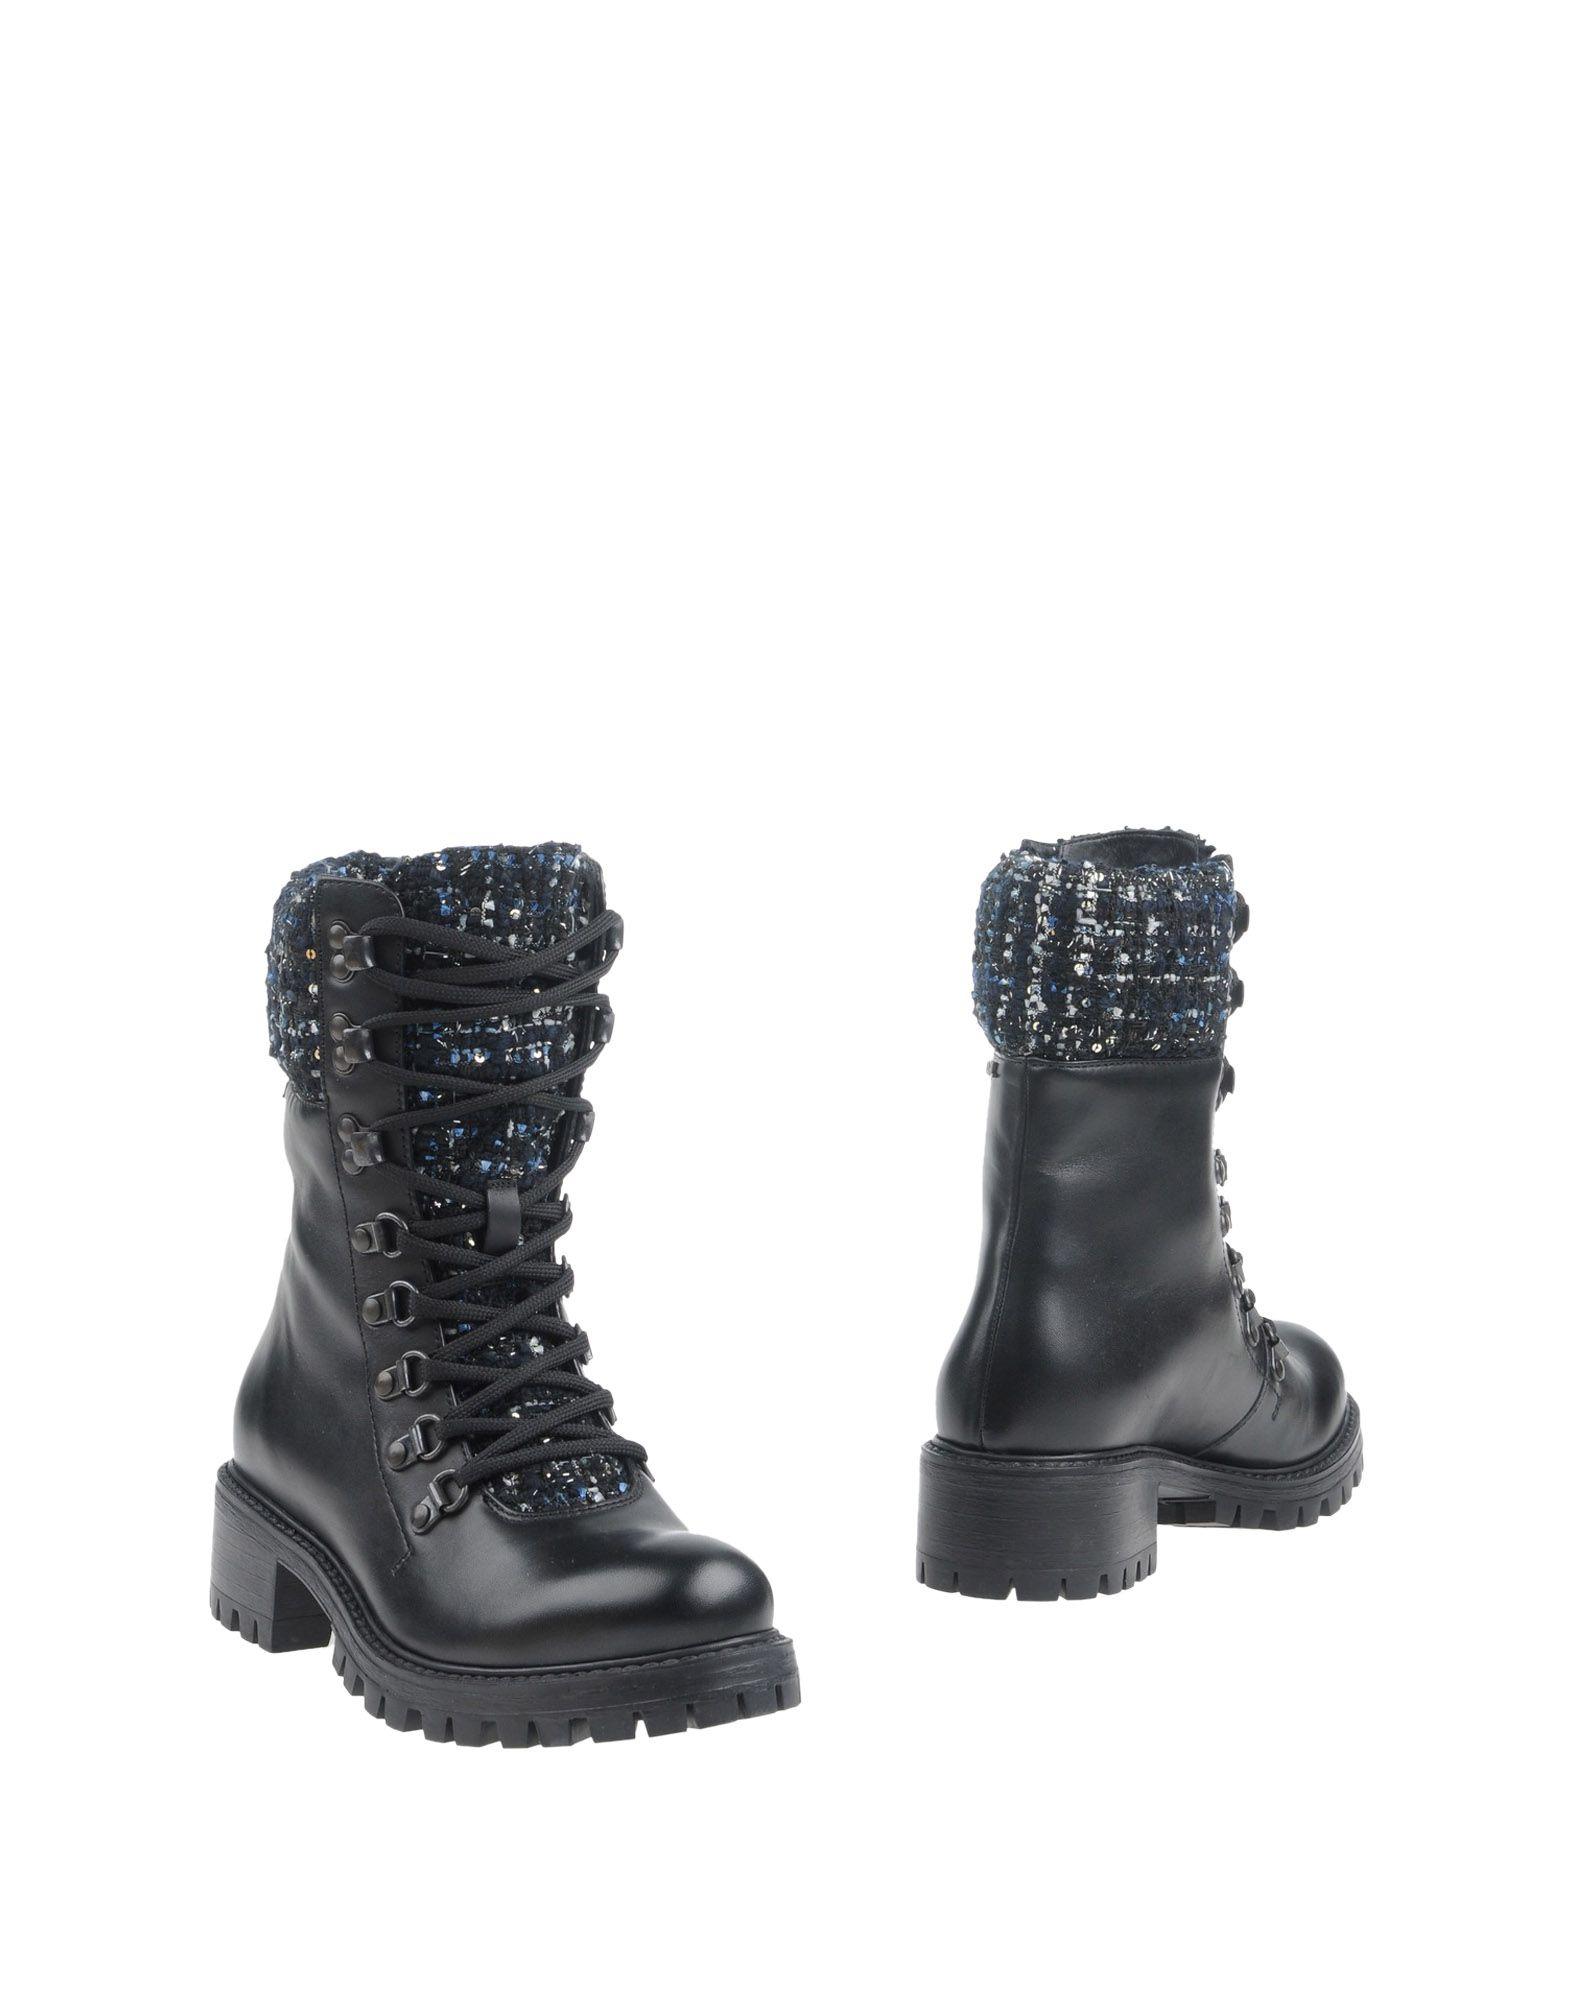 KARL LAGERFELD Полусапоги и высокие ботинки hot selling internal grooving and turning tool holder c20q qfdl05 27 c20q qfdr05 27 for zccct carbide insert ztfd0303 mg